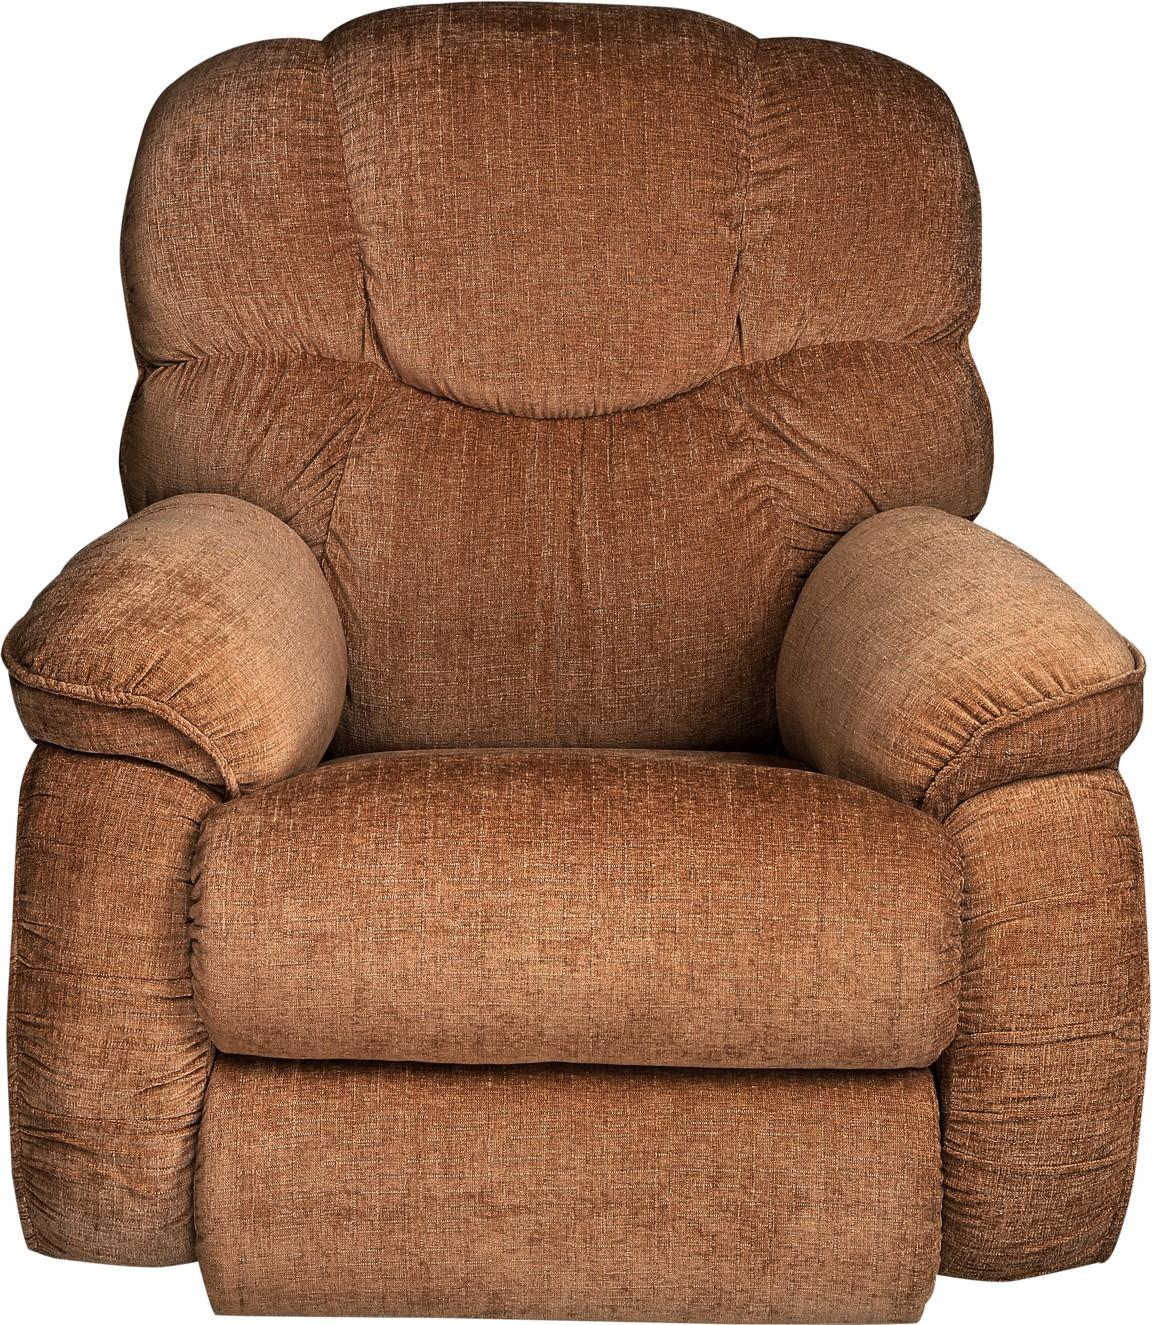 View La-Z-Boy Dreamtime Fabric Manual Rocker Recliners(Finish Color - Brown) Furniture (La-Z-Boy)